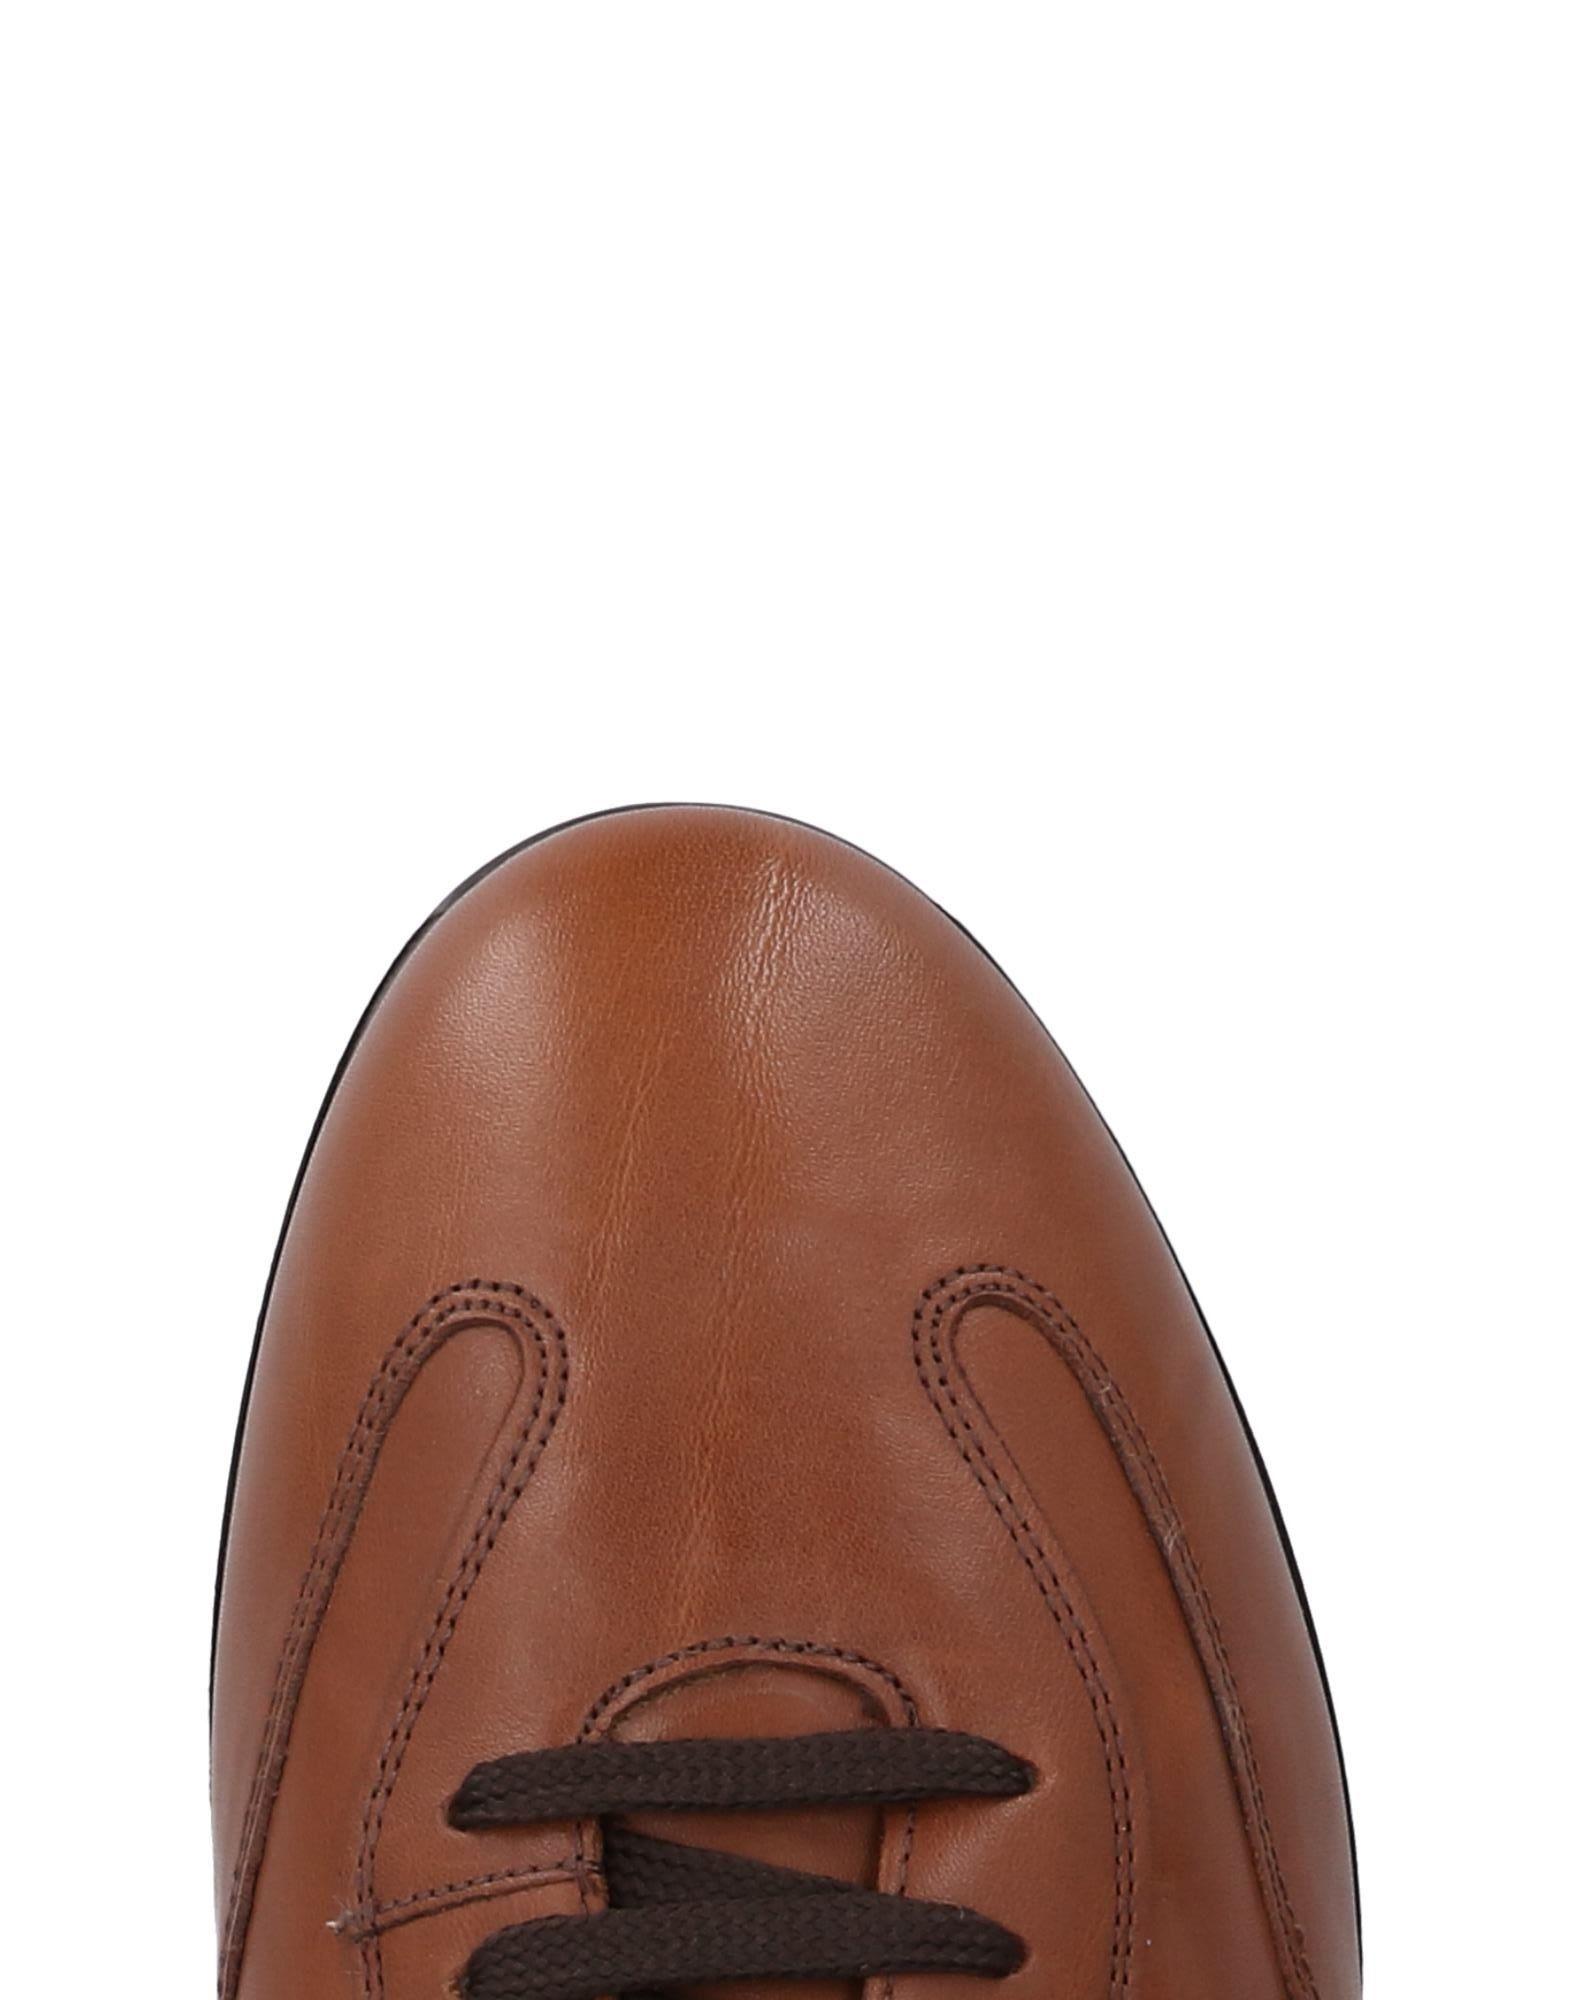 Geox Sneakers Sneakers Sneakers - Men Geox Sneakers online on  Australia - 11496715OF 0f0dc7